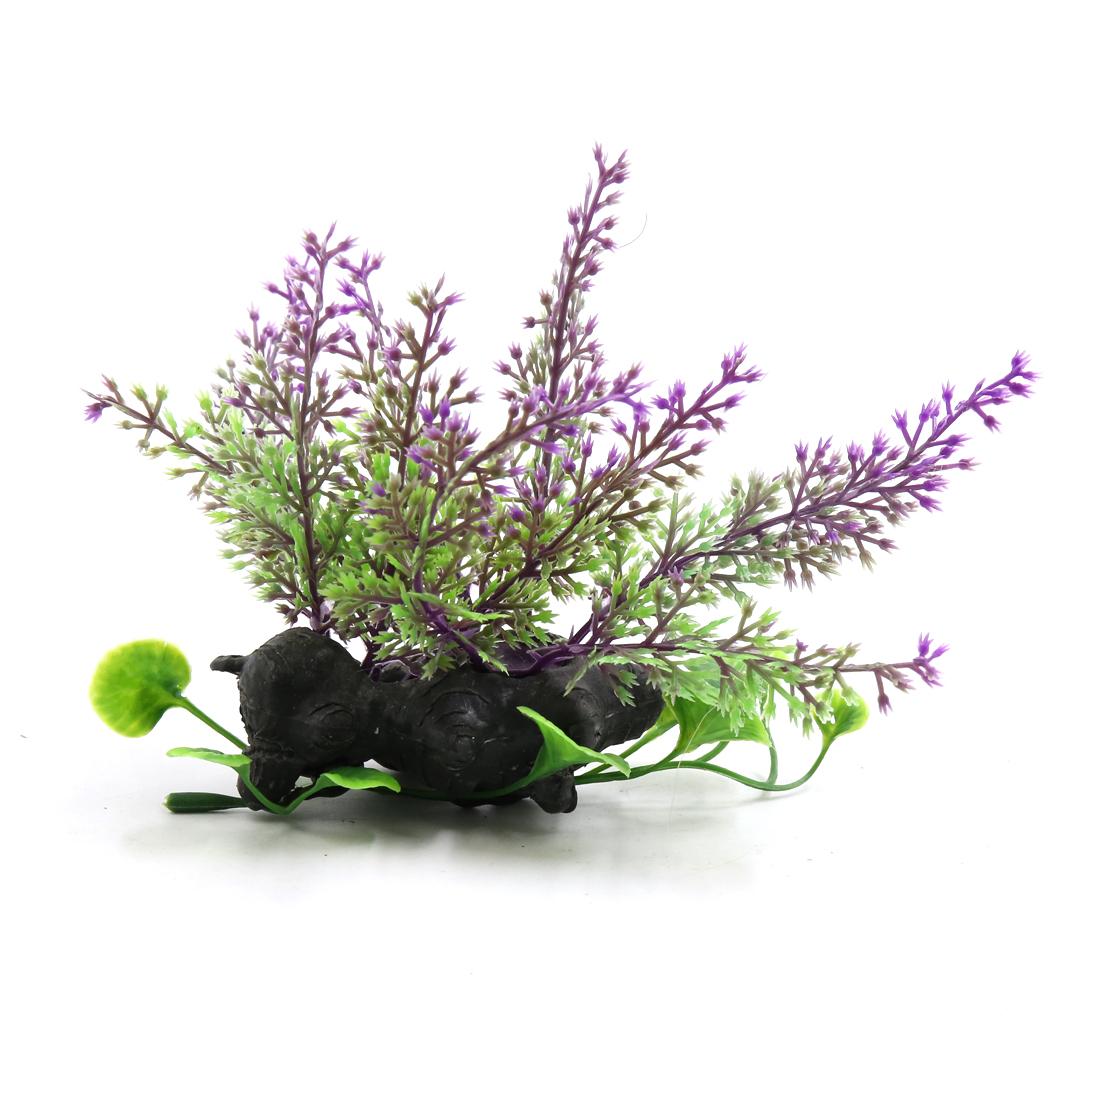 Purple Plastic Fish Tank Terrarium Plants Ornament for Reptiles w Ceramic Base